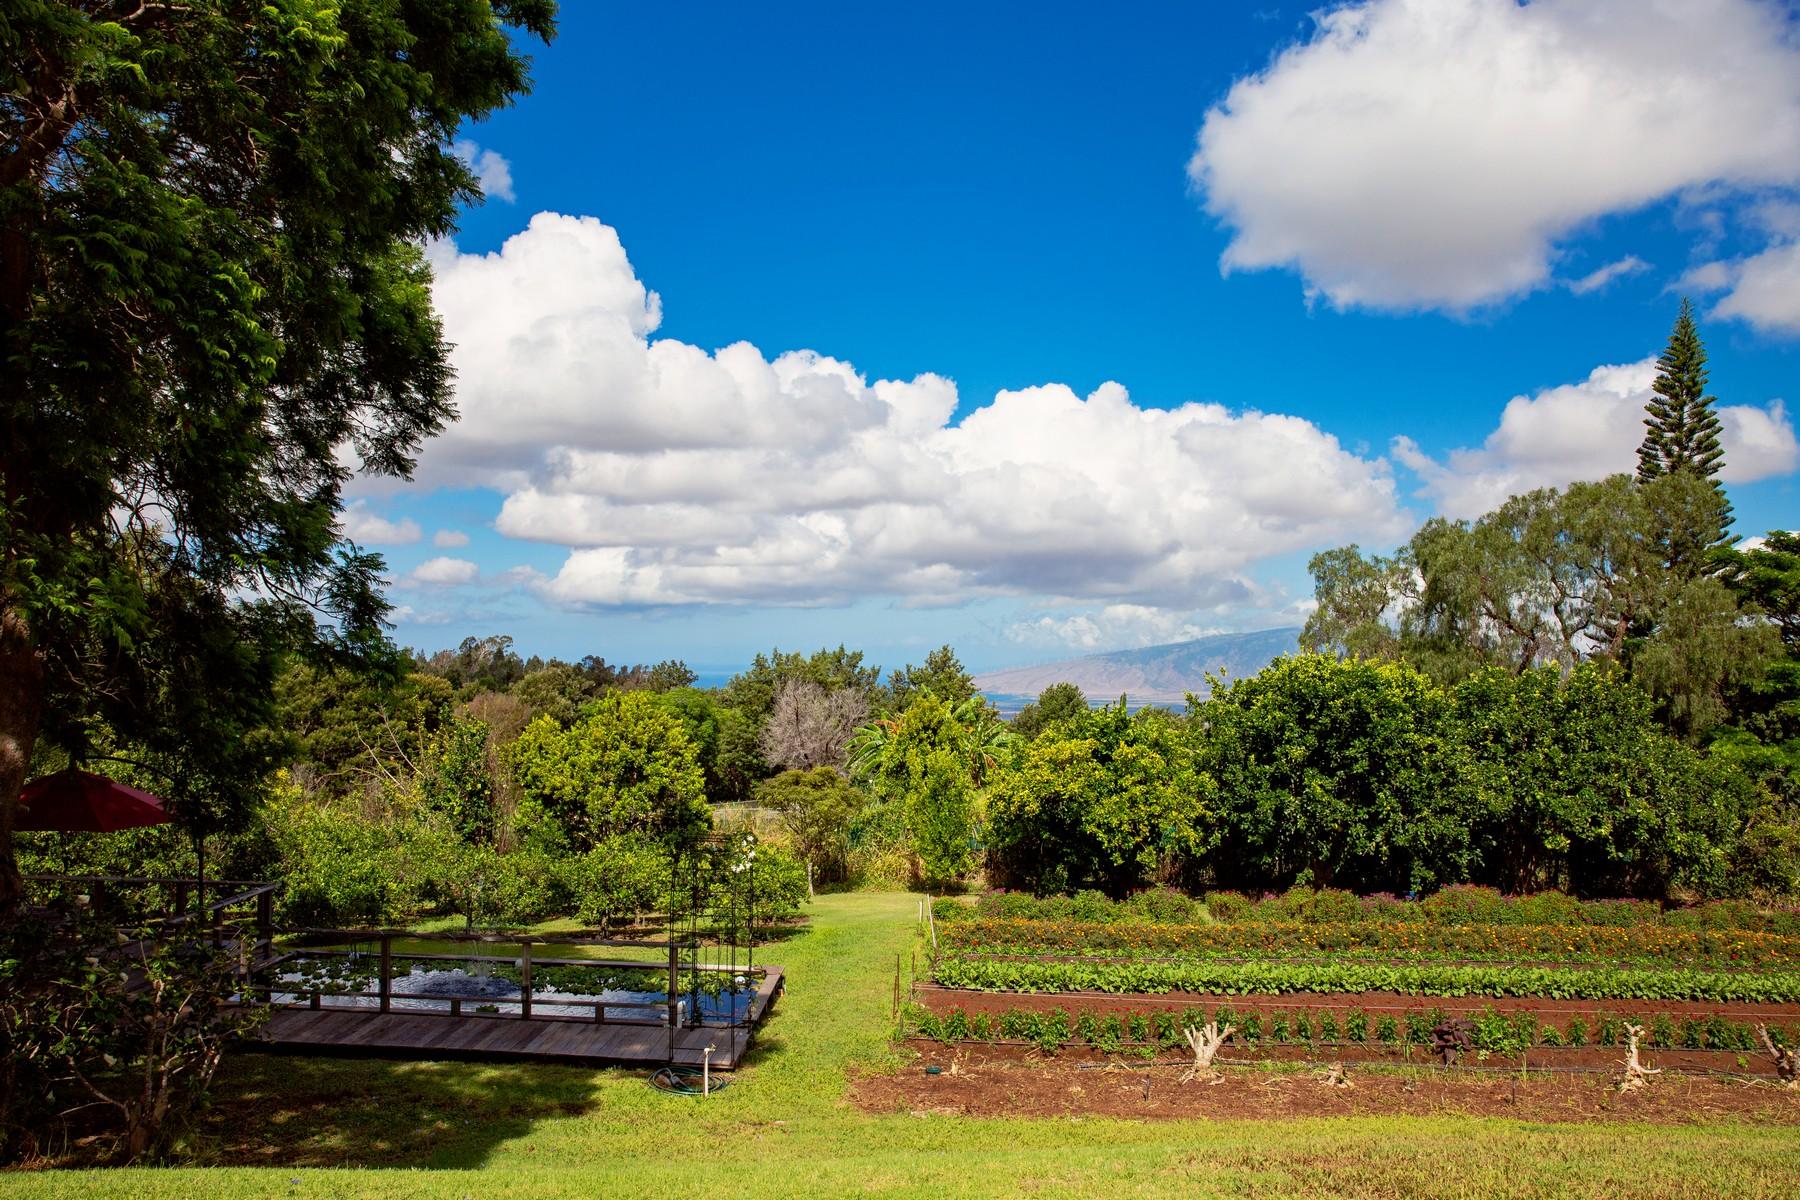 Farm / Ranch / Plantation for Sale at Bountiful Upcountry Home & Farm 200 Hoopalua Drive Makawao, Hawaii 96768 United States